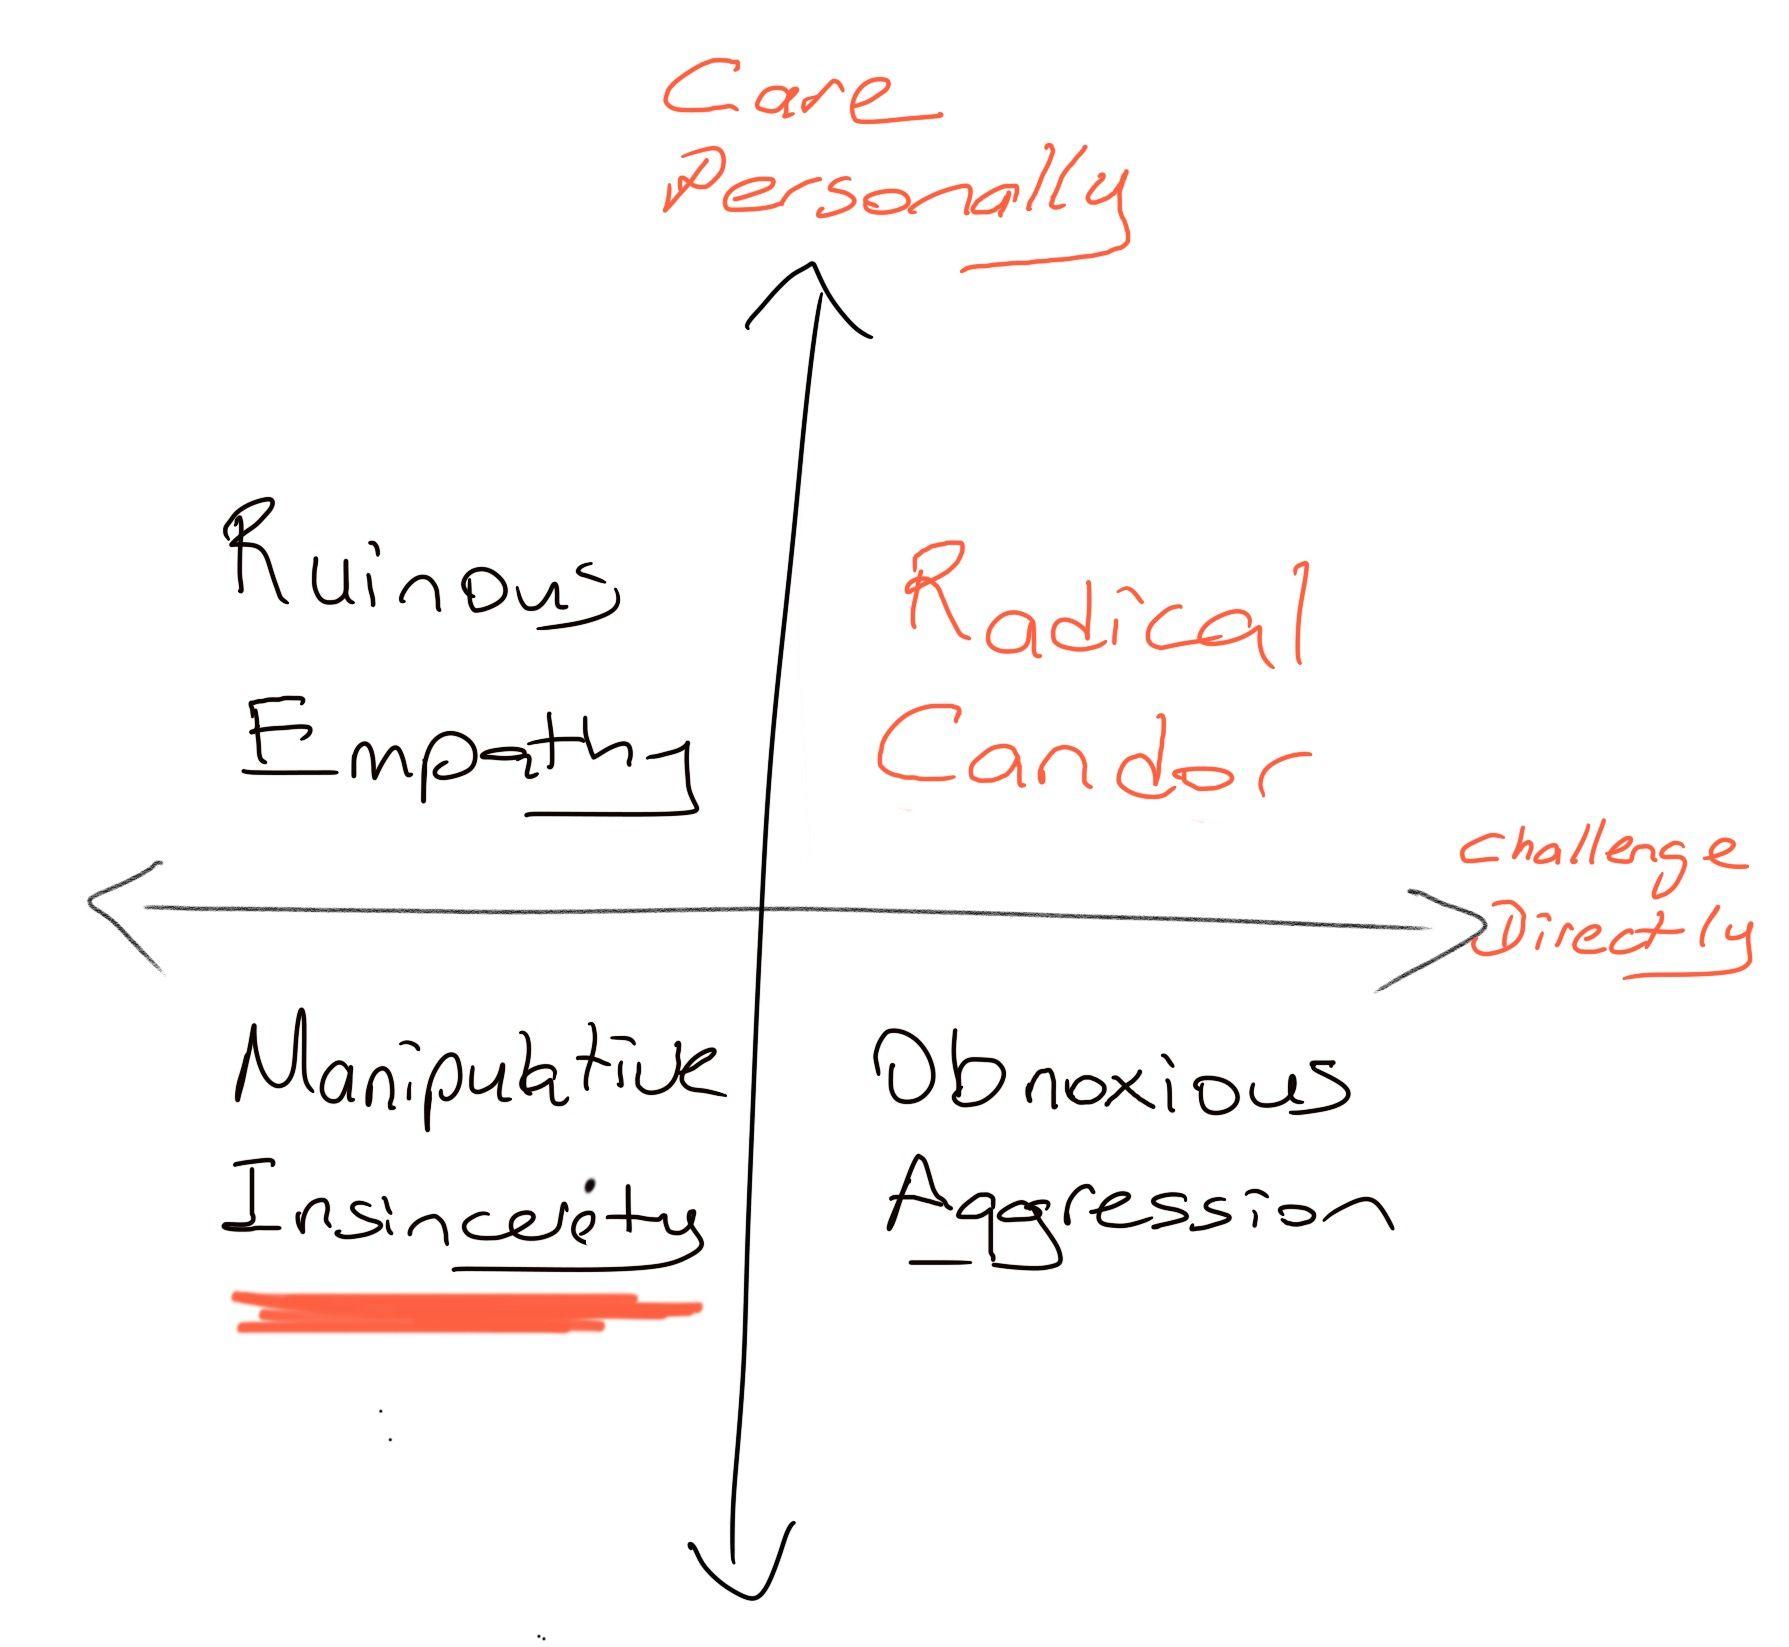 Radical Candor - Manipulative Insincerity Quadrant